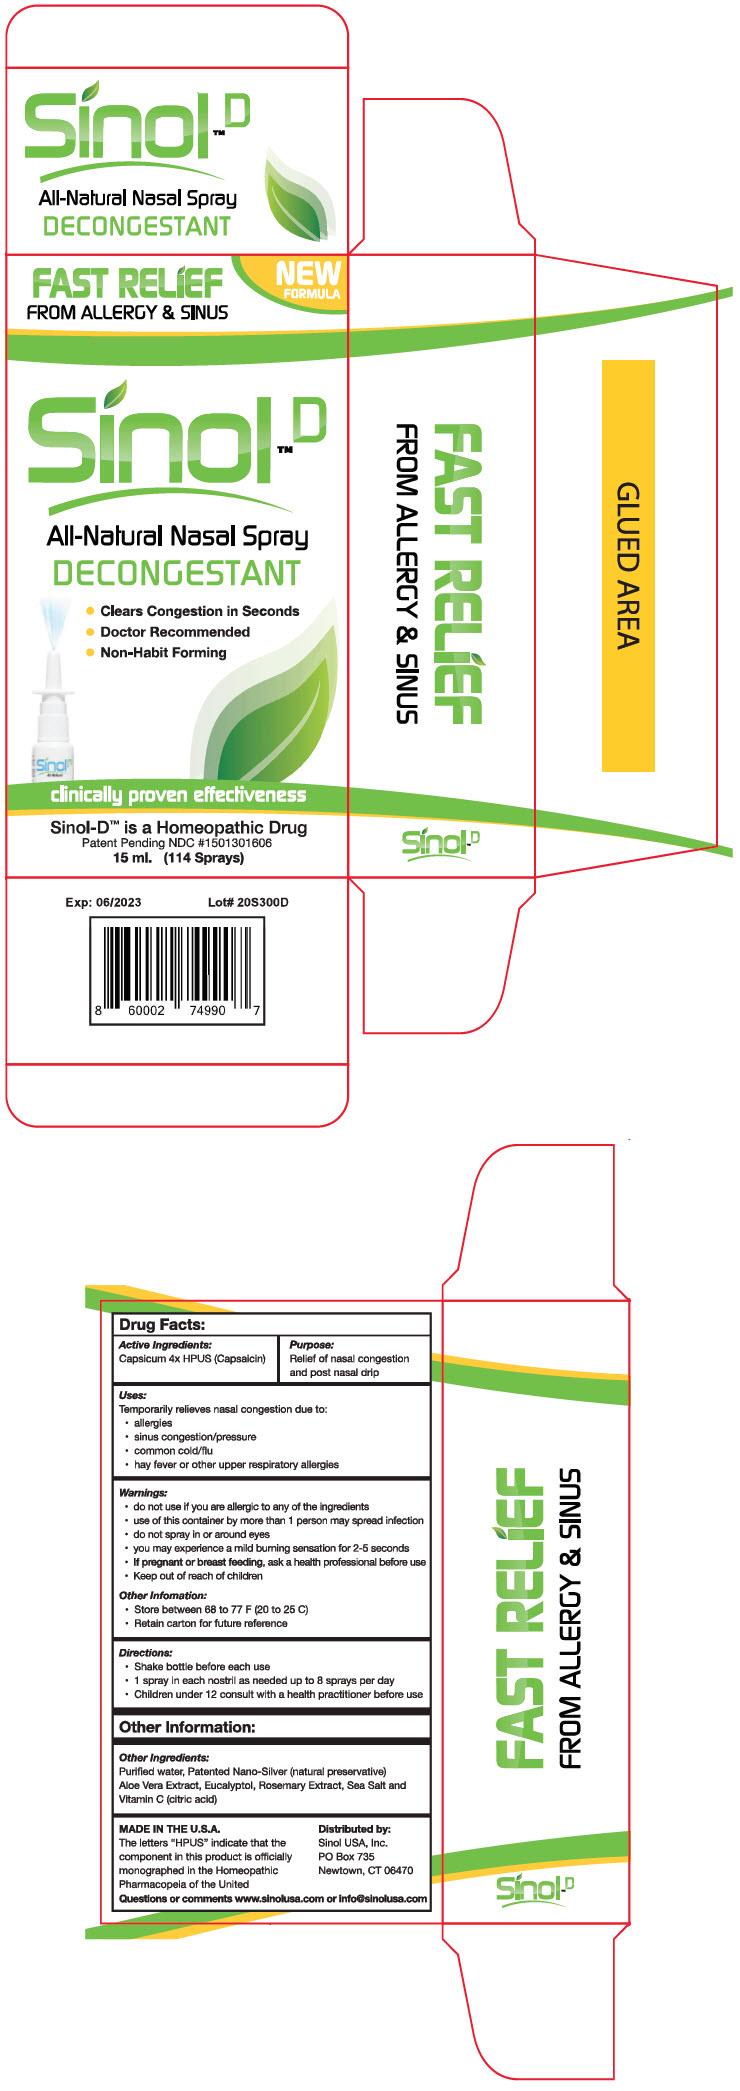 PRINCIPAL DISPLAY PANEL - 15 ml Bottle Carton